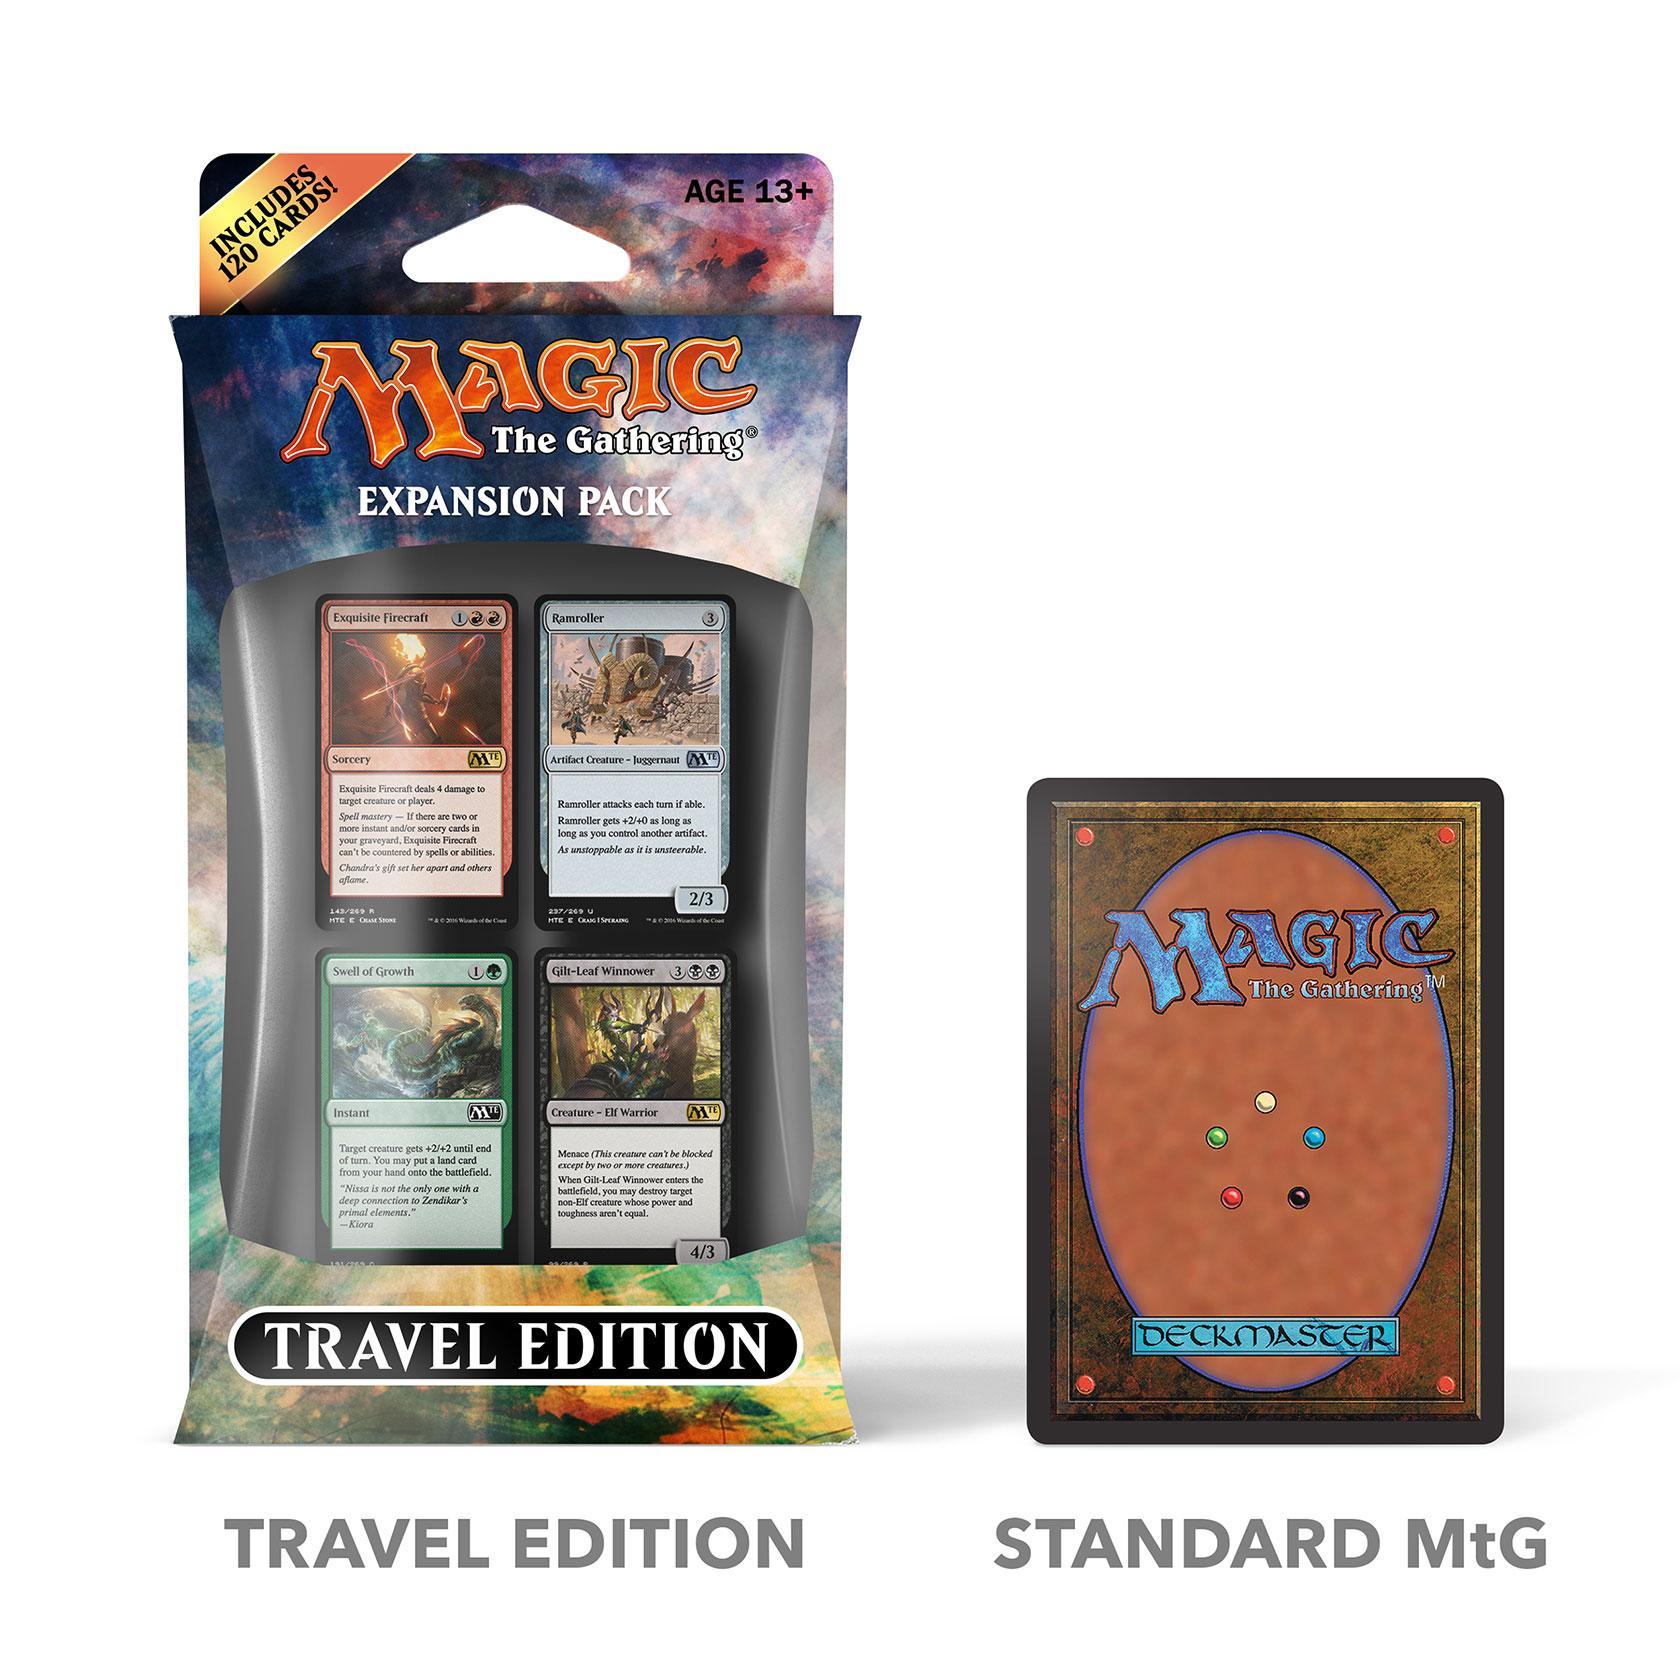 ivpi_magic_the_gathering_travel_edition_expansion-pr